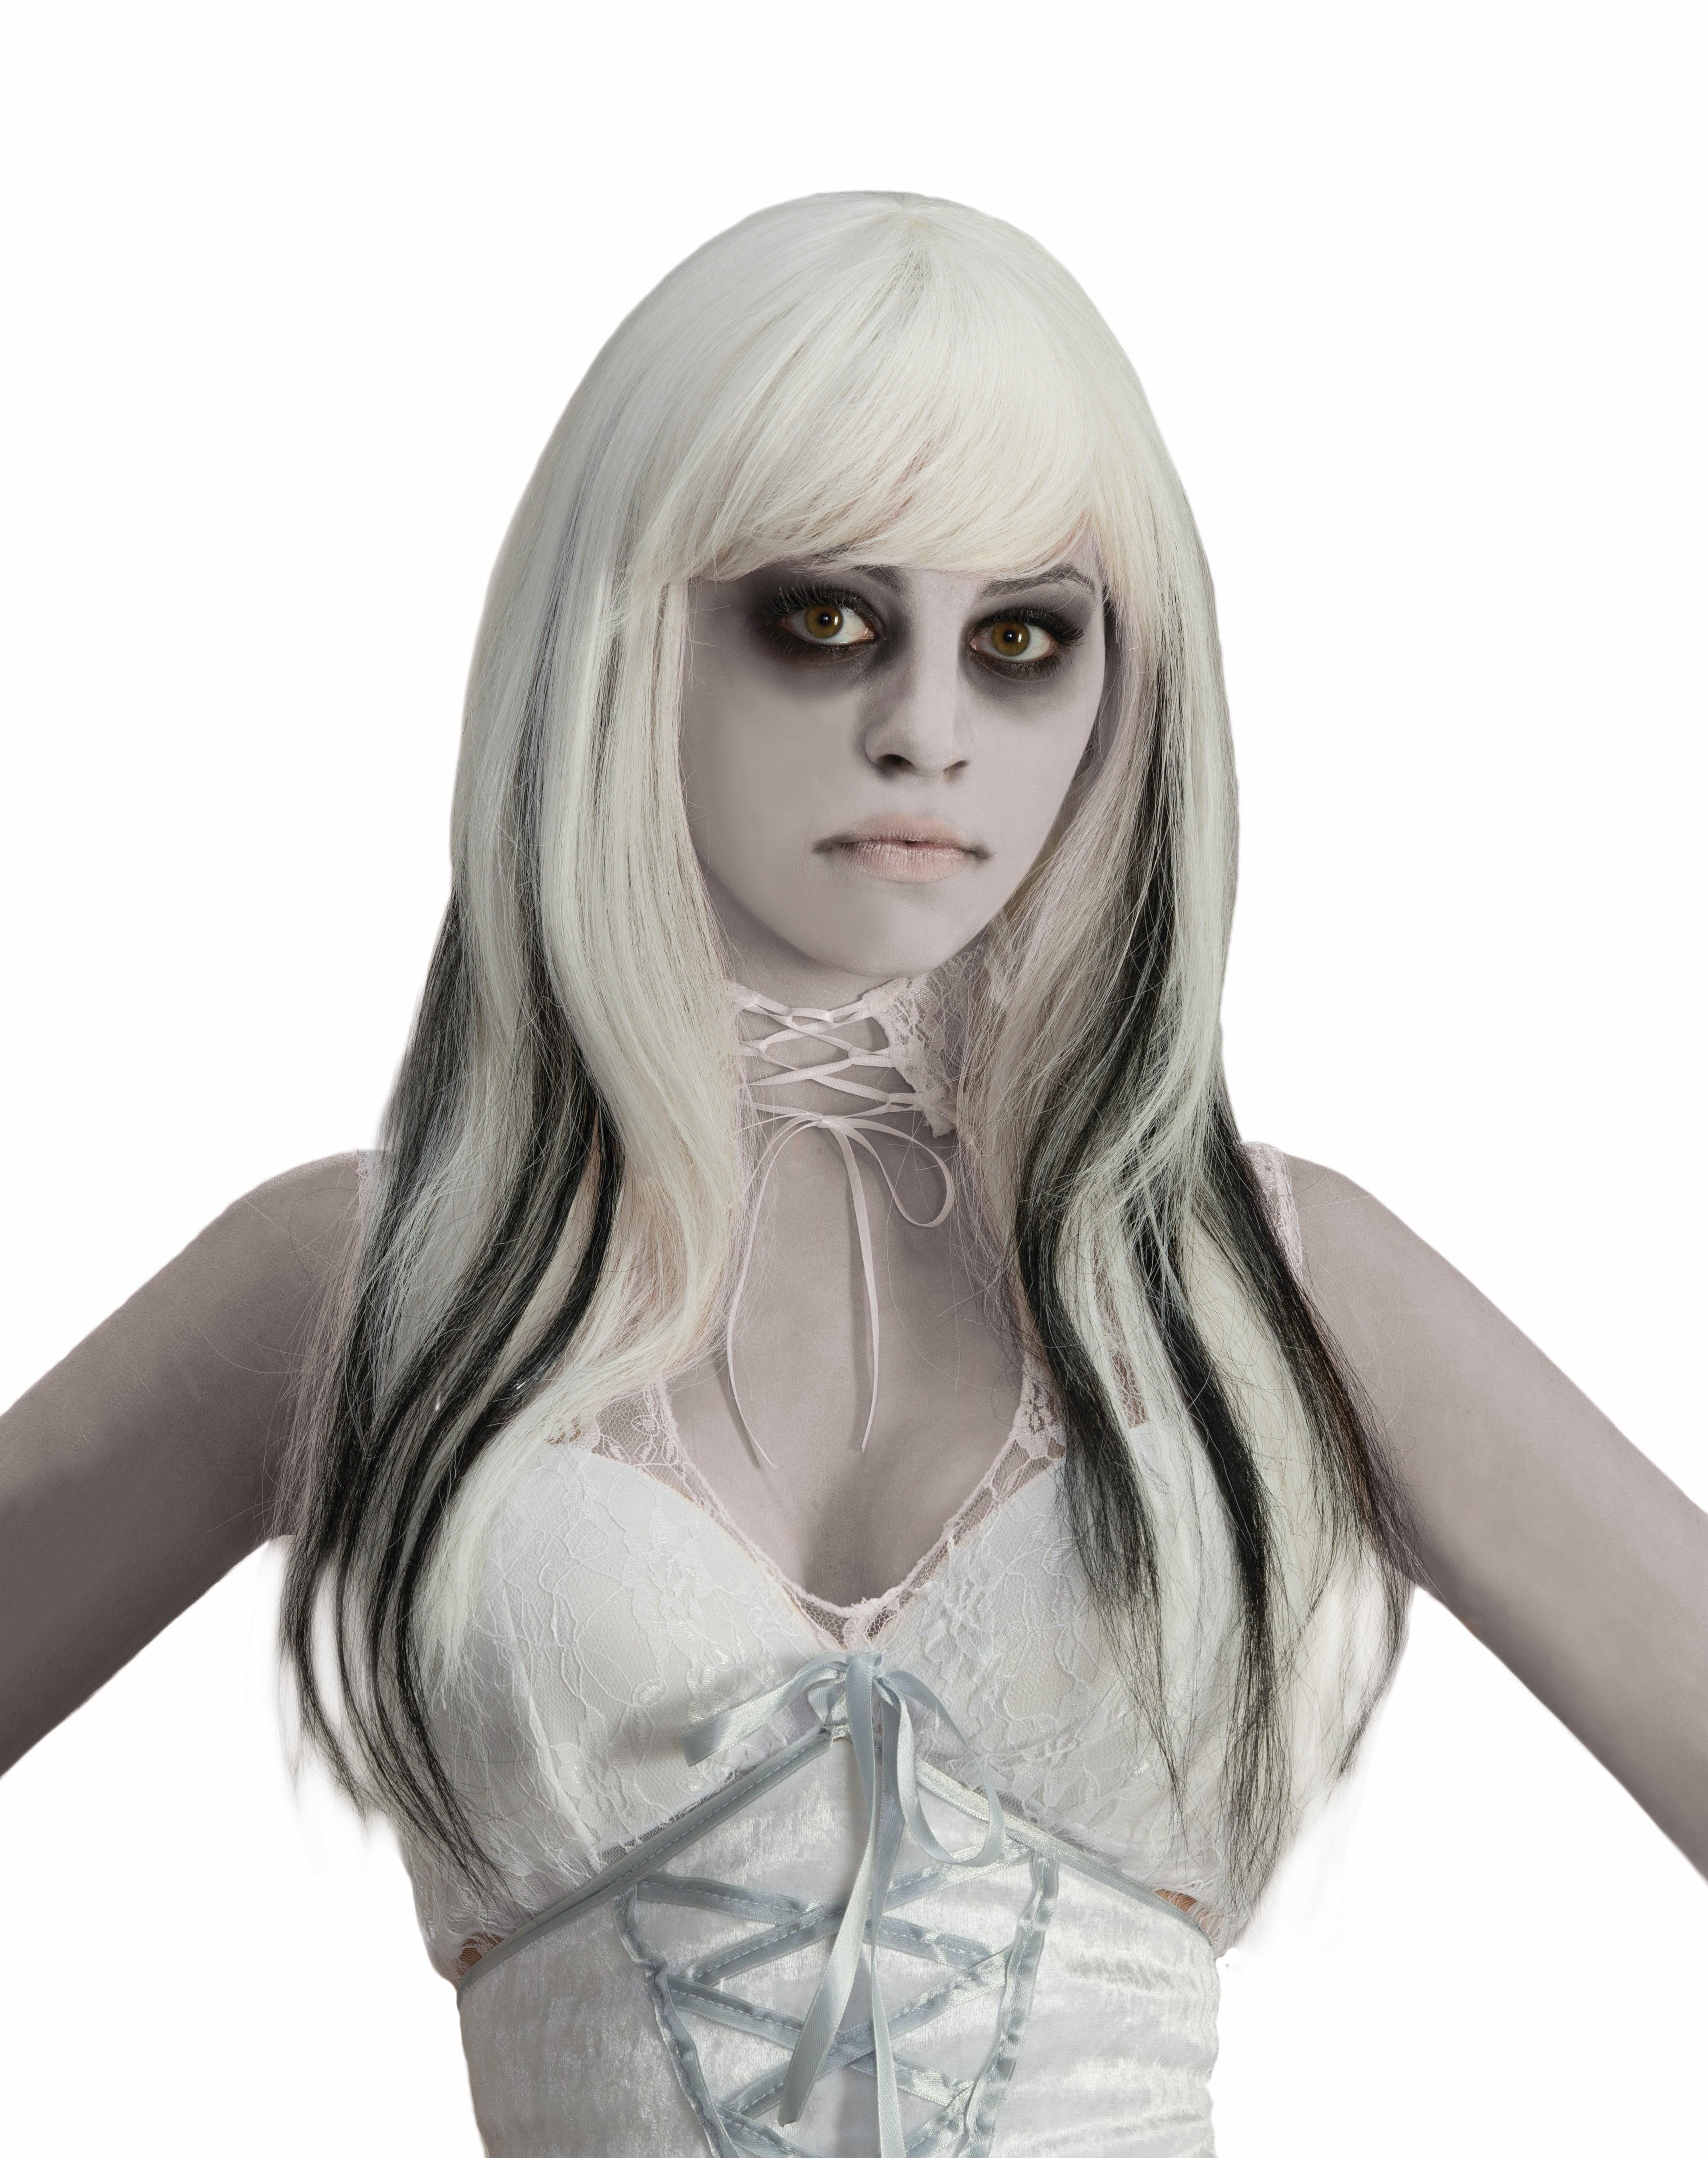 phantom ghost black & white costume wig adult one size